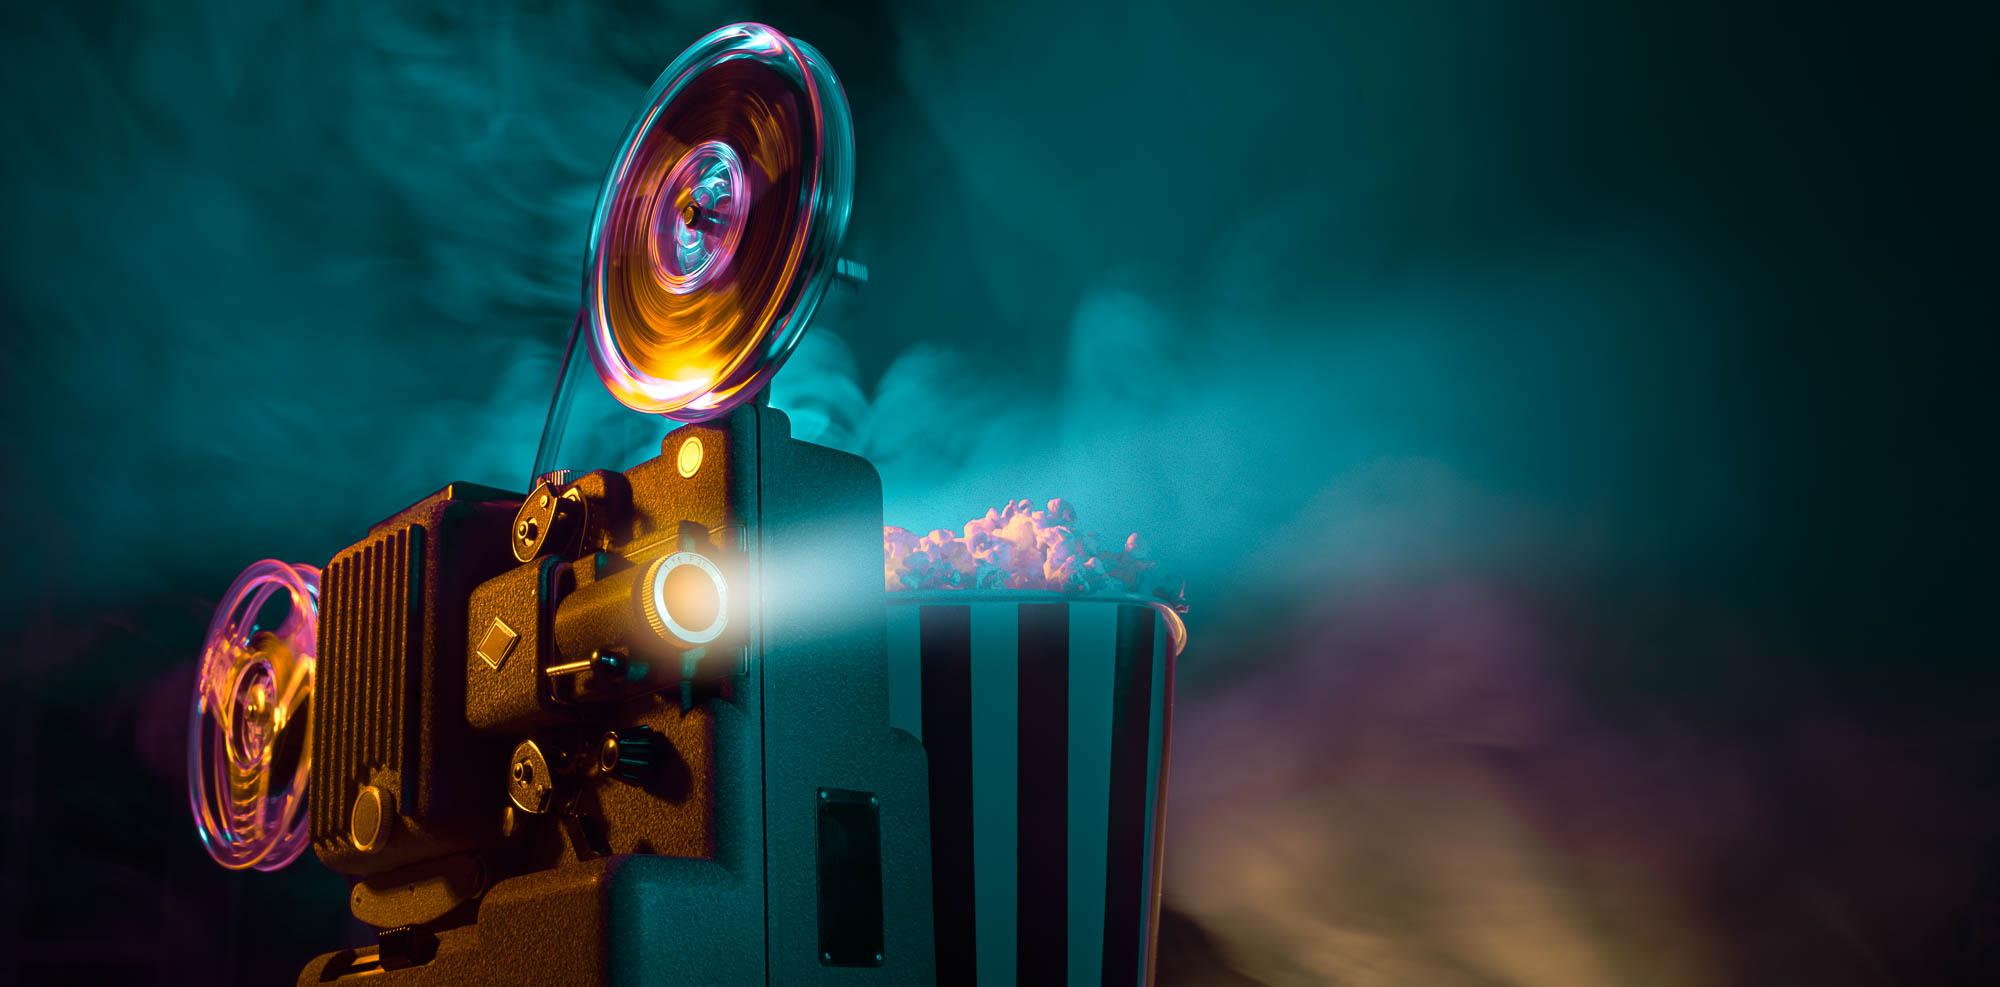 5-videomaker vercelli novara borgosesia varallo